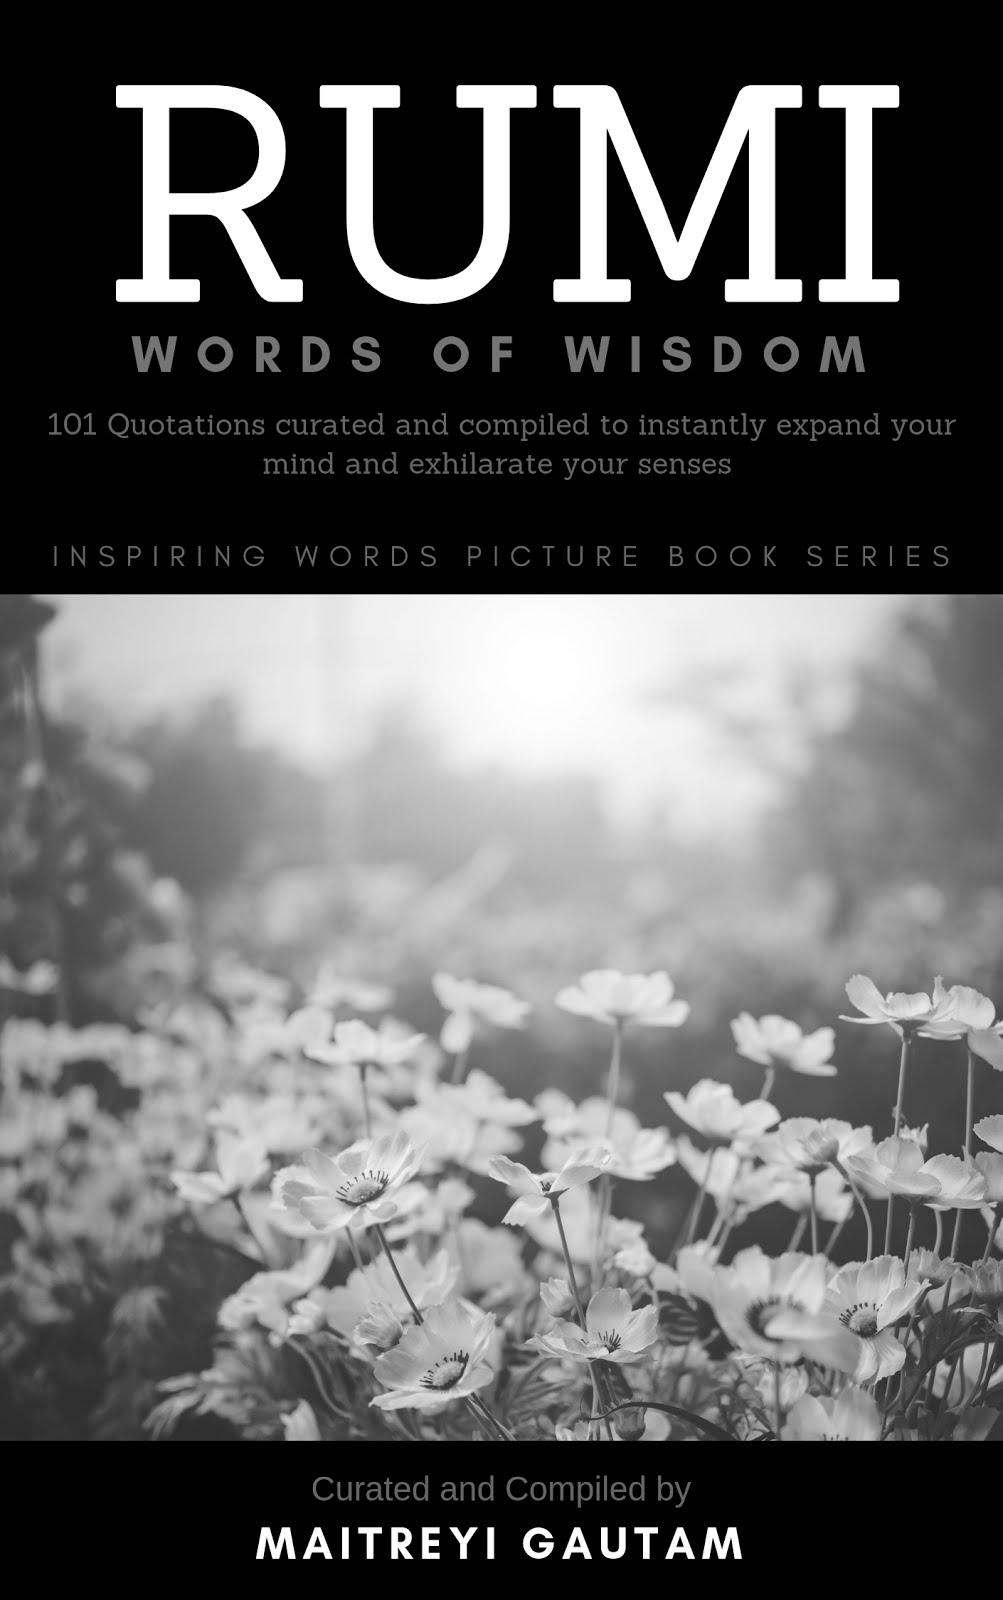 Rumi: Words of Wisdom